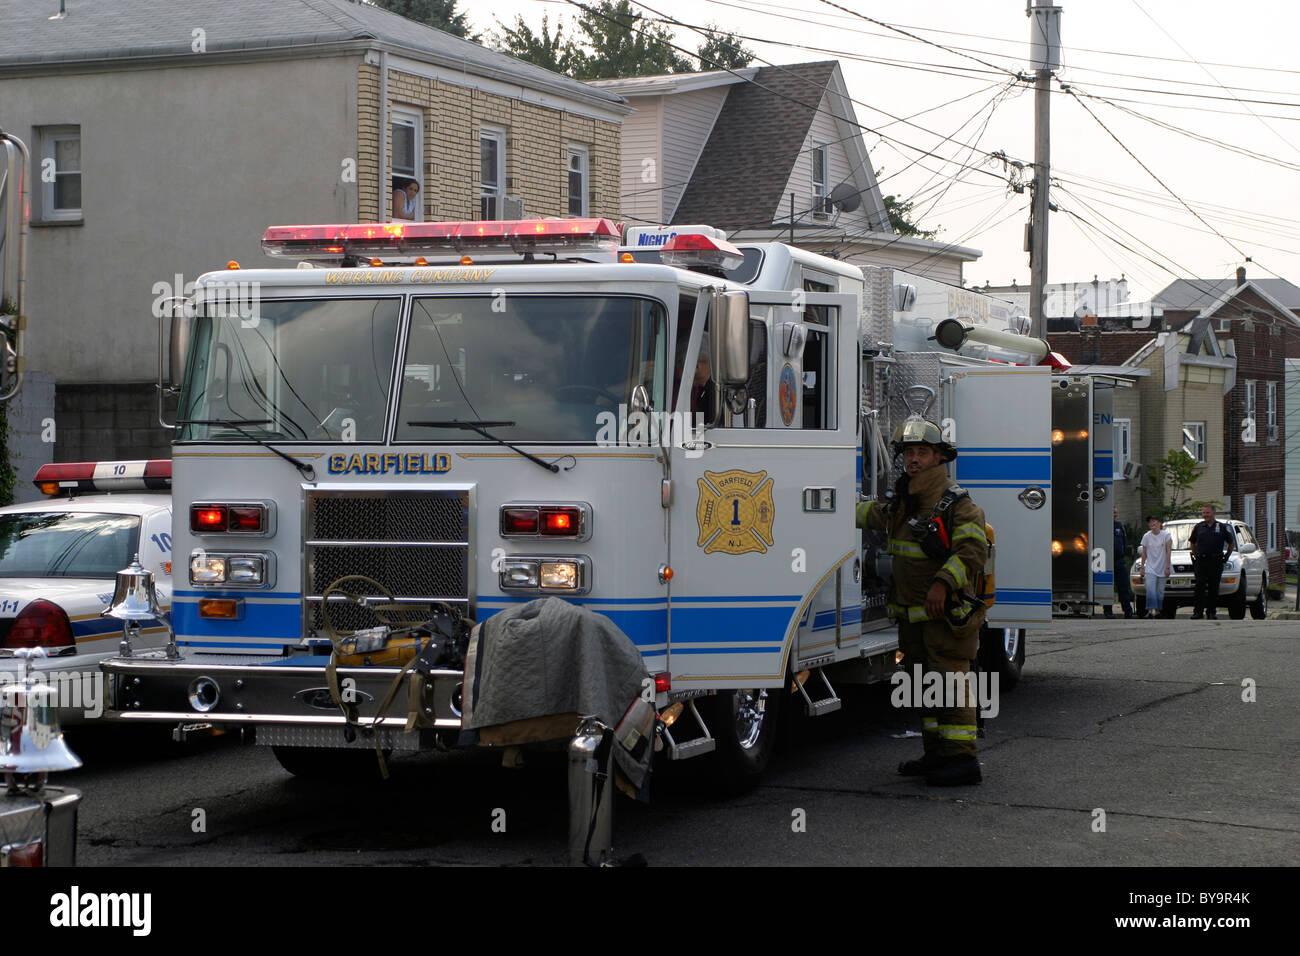 Garfield Nj Pierce Lance Fire Truck Stock Image